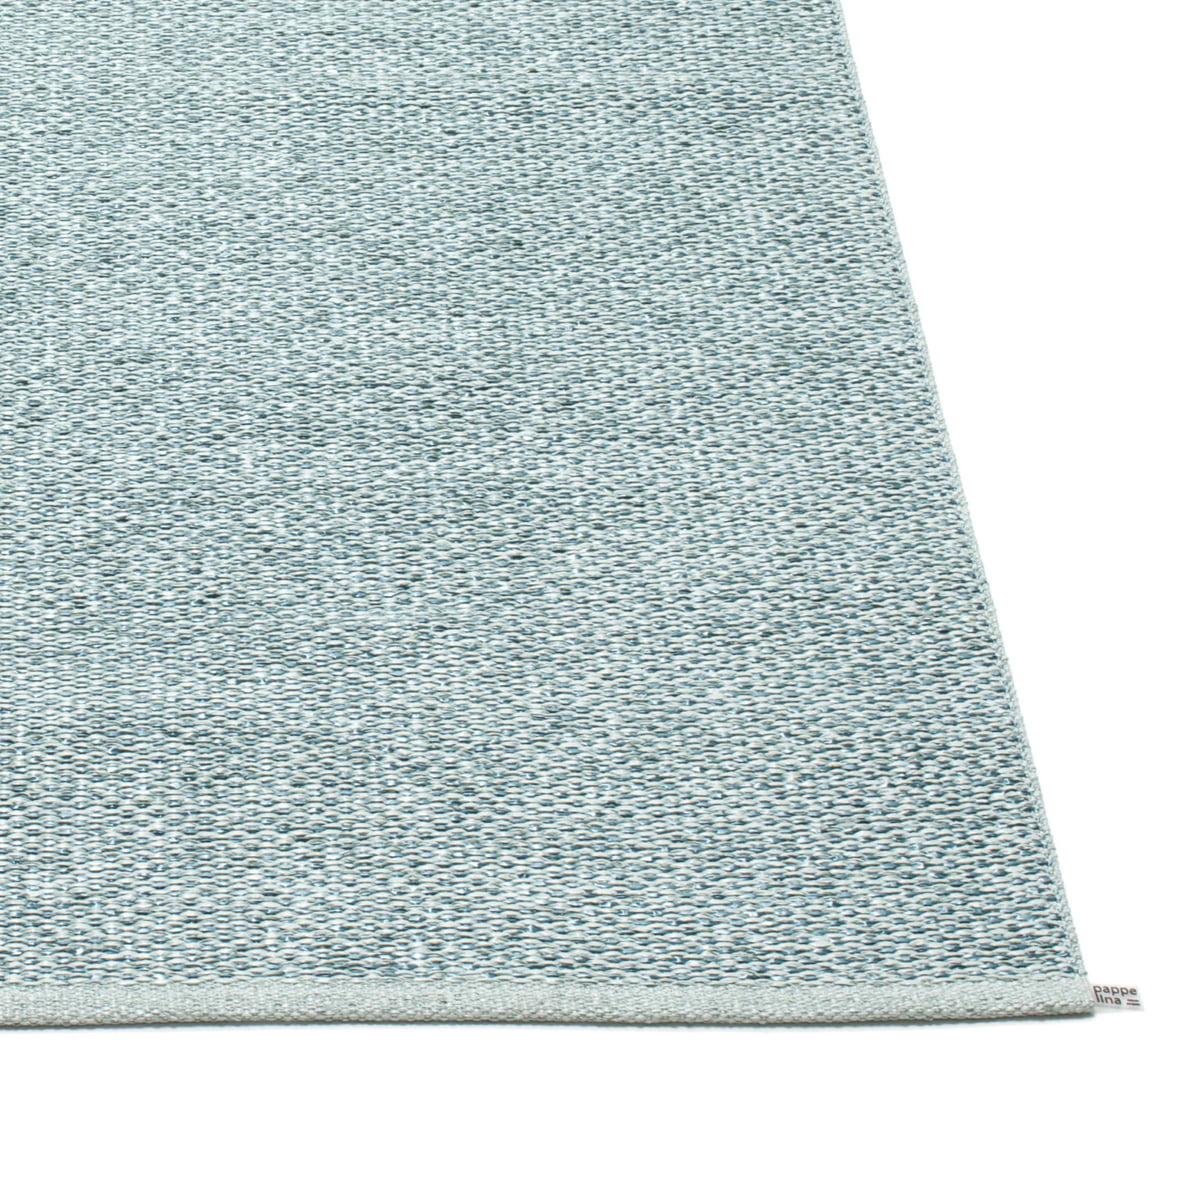 svea outdoor teppich von pappelina im shop. Black Bedroom Furniture Sets. Home Design Ideas